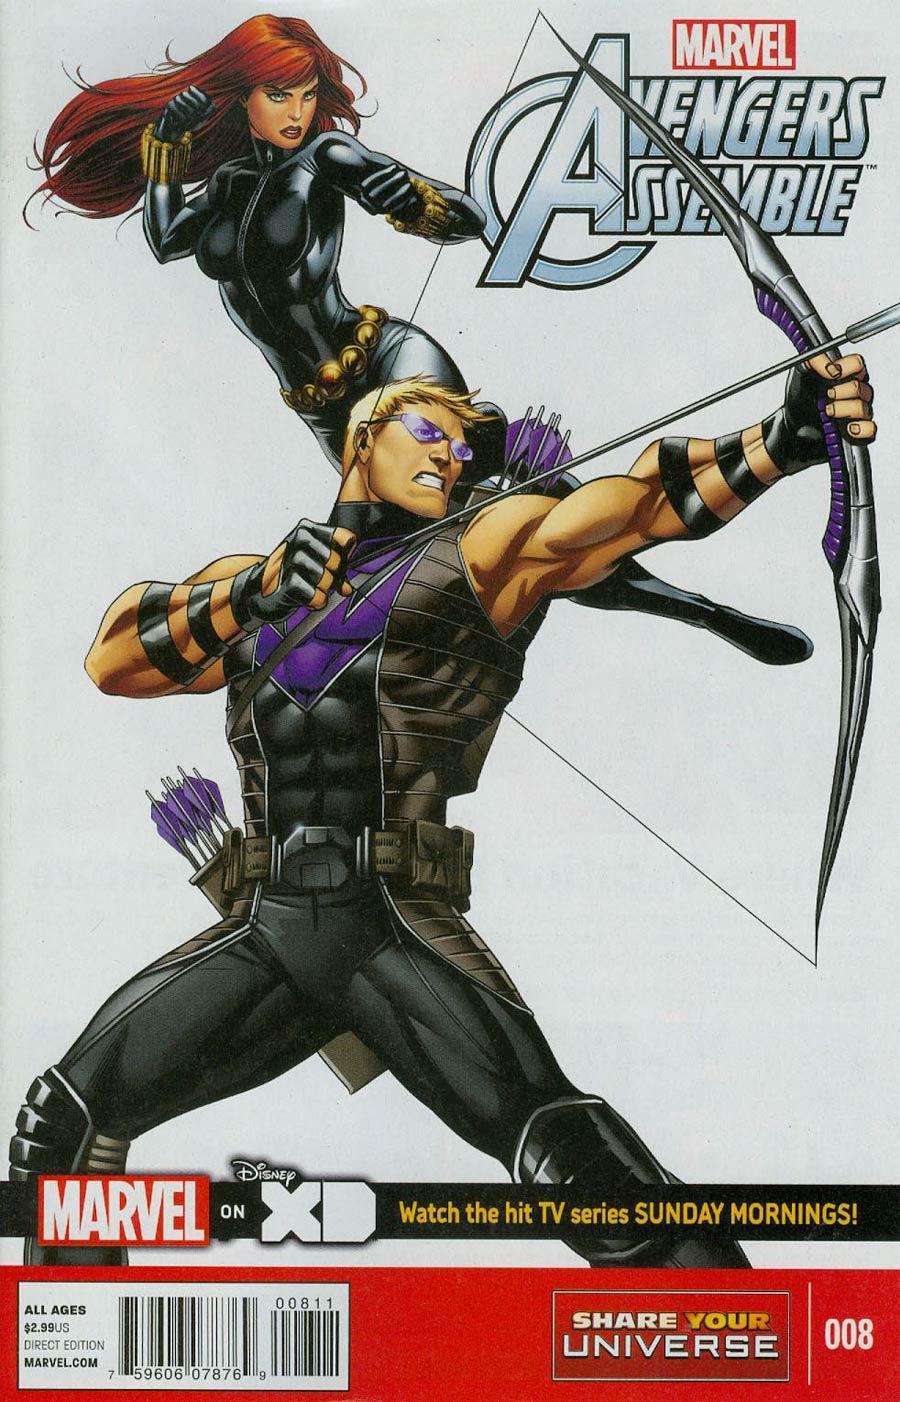 Marvel Universe Avengers Assemble #8